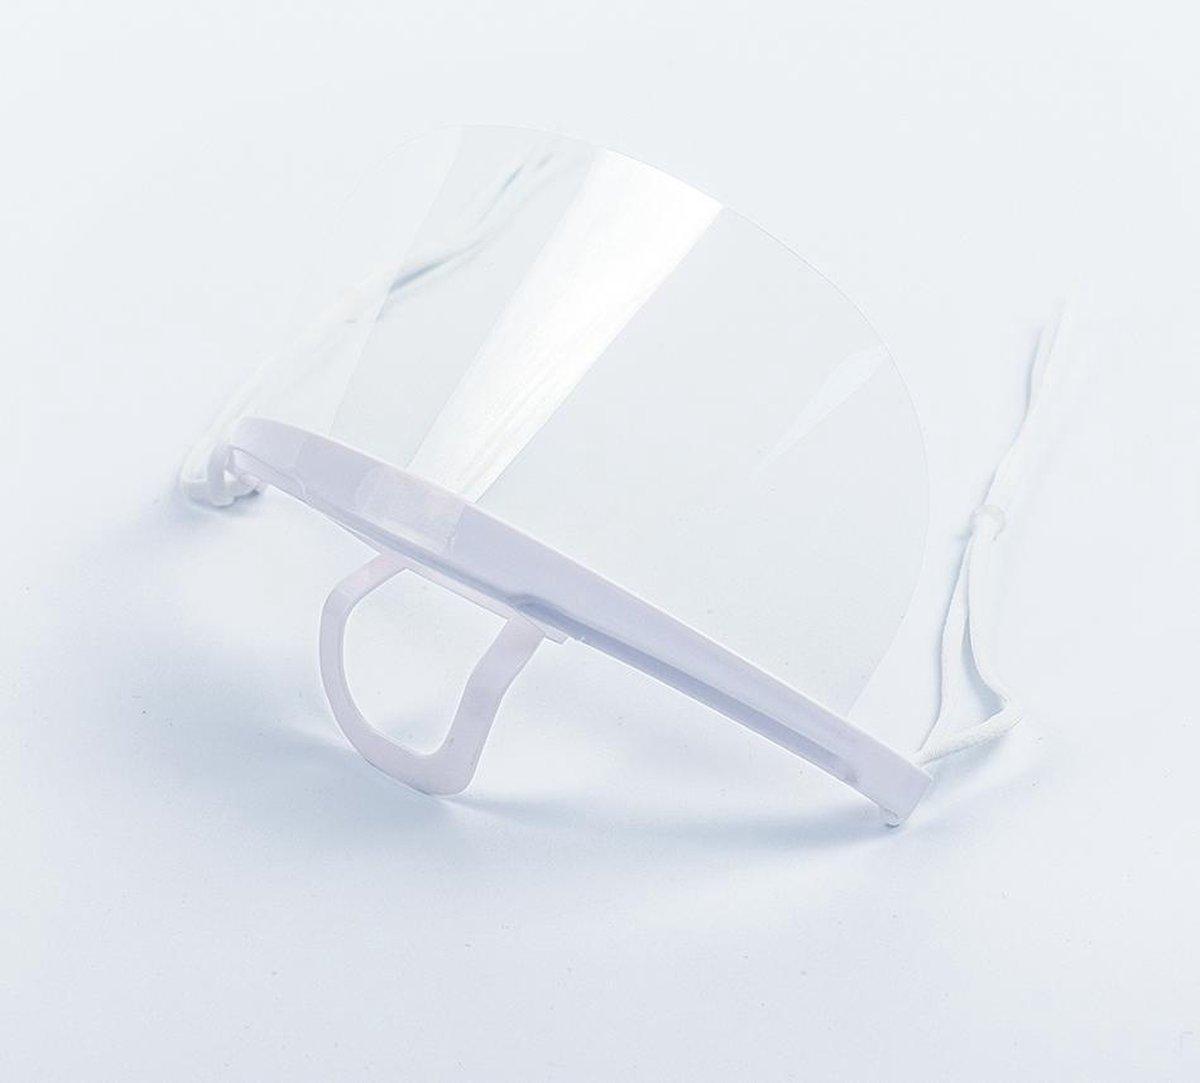 10 stuks -  Transparante mondkapjes met elastiek - Mondkapje Wasbaar - Mondkapje Brildrager - Hygiën